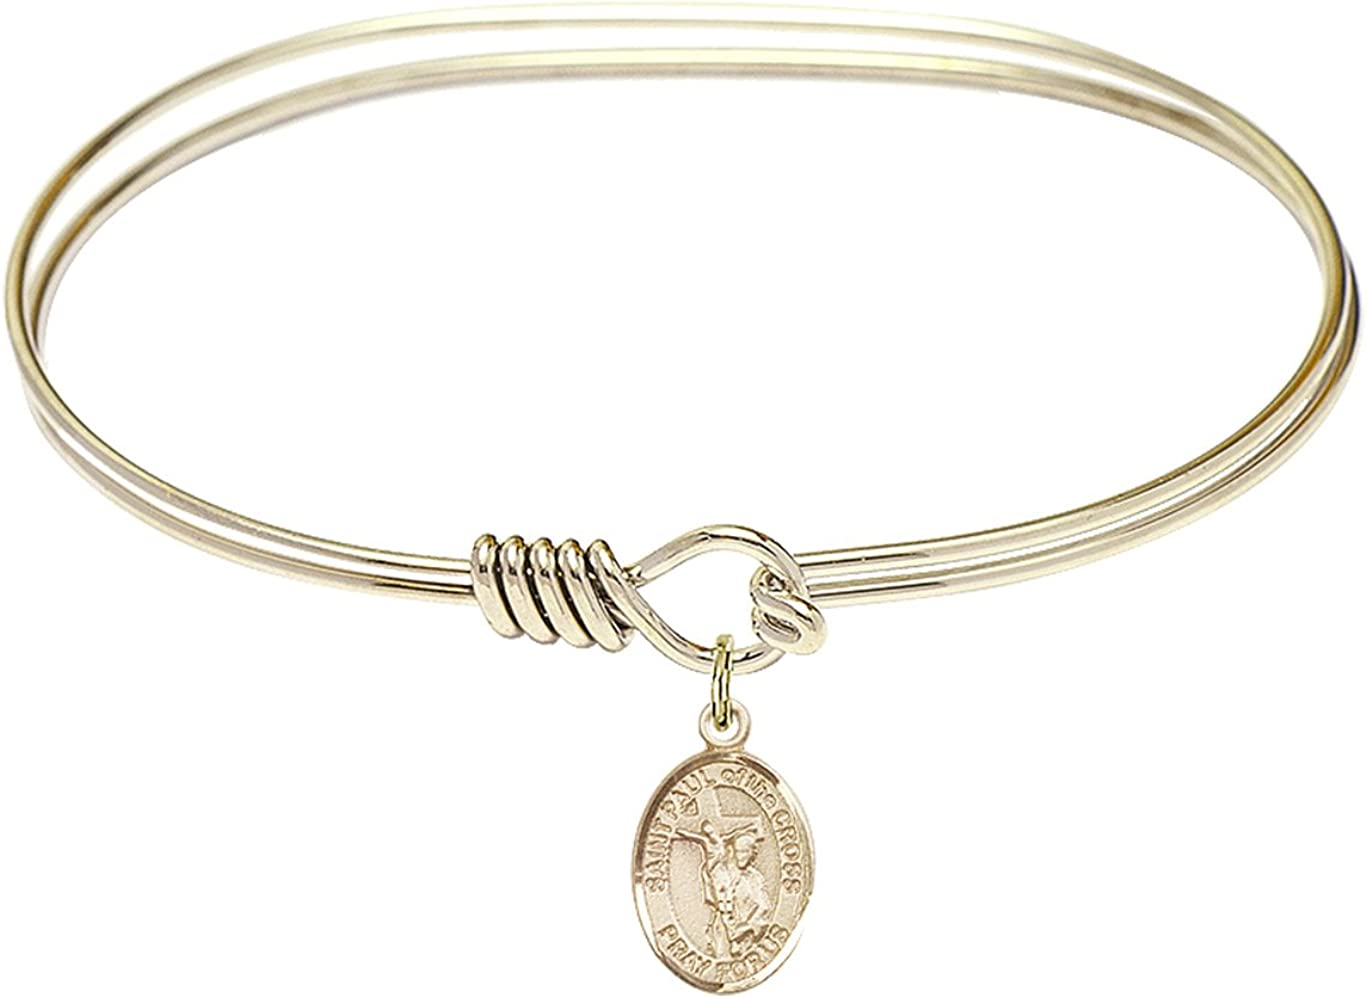 DiamondJewelryNY Eye Hook Bangle Bracelet with of a Paul Bombing free Max 76% OFF shipping The St.